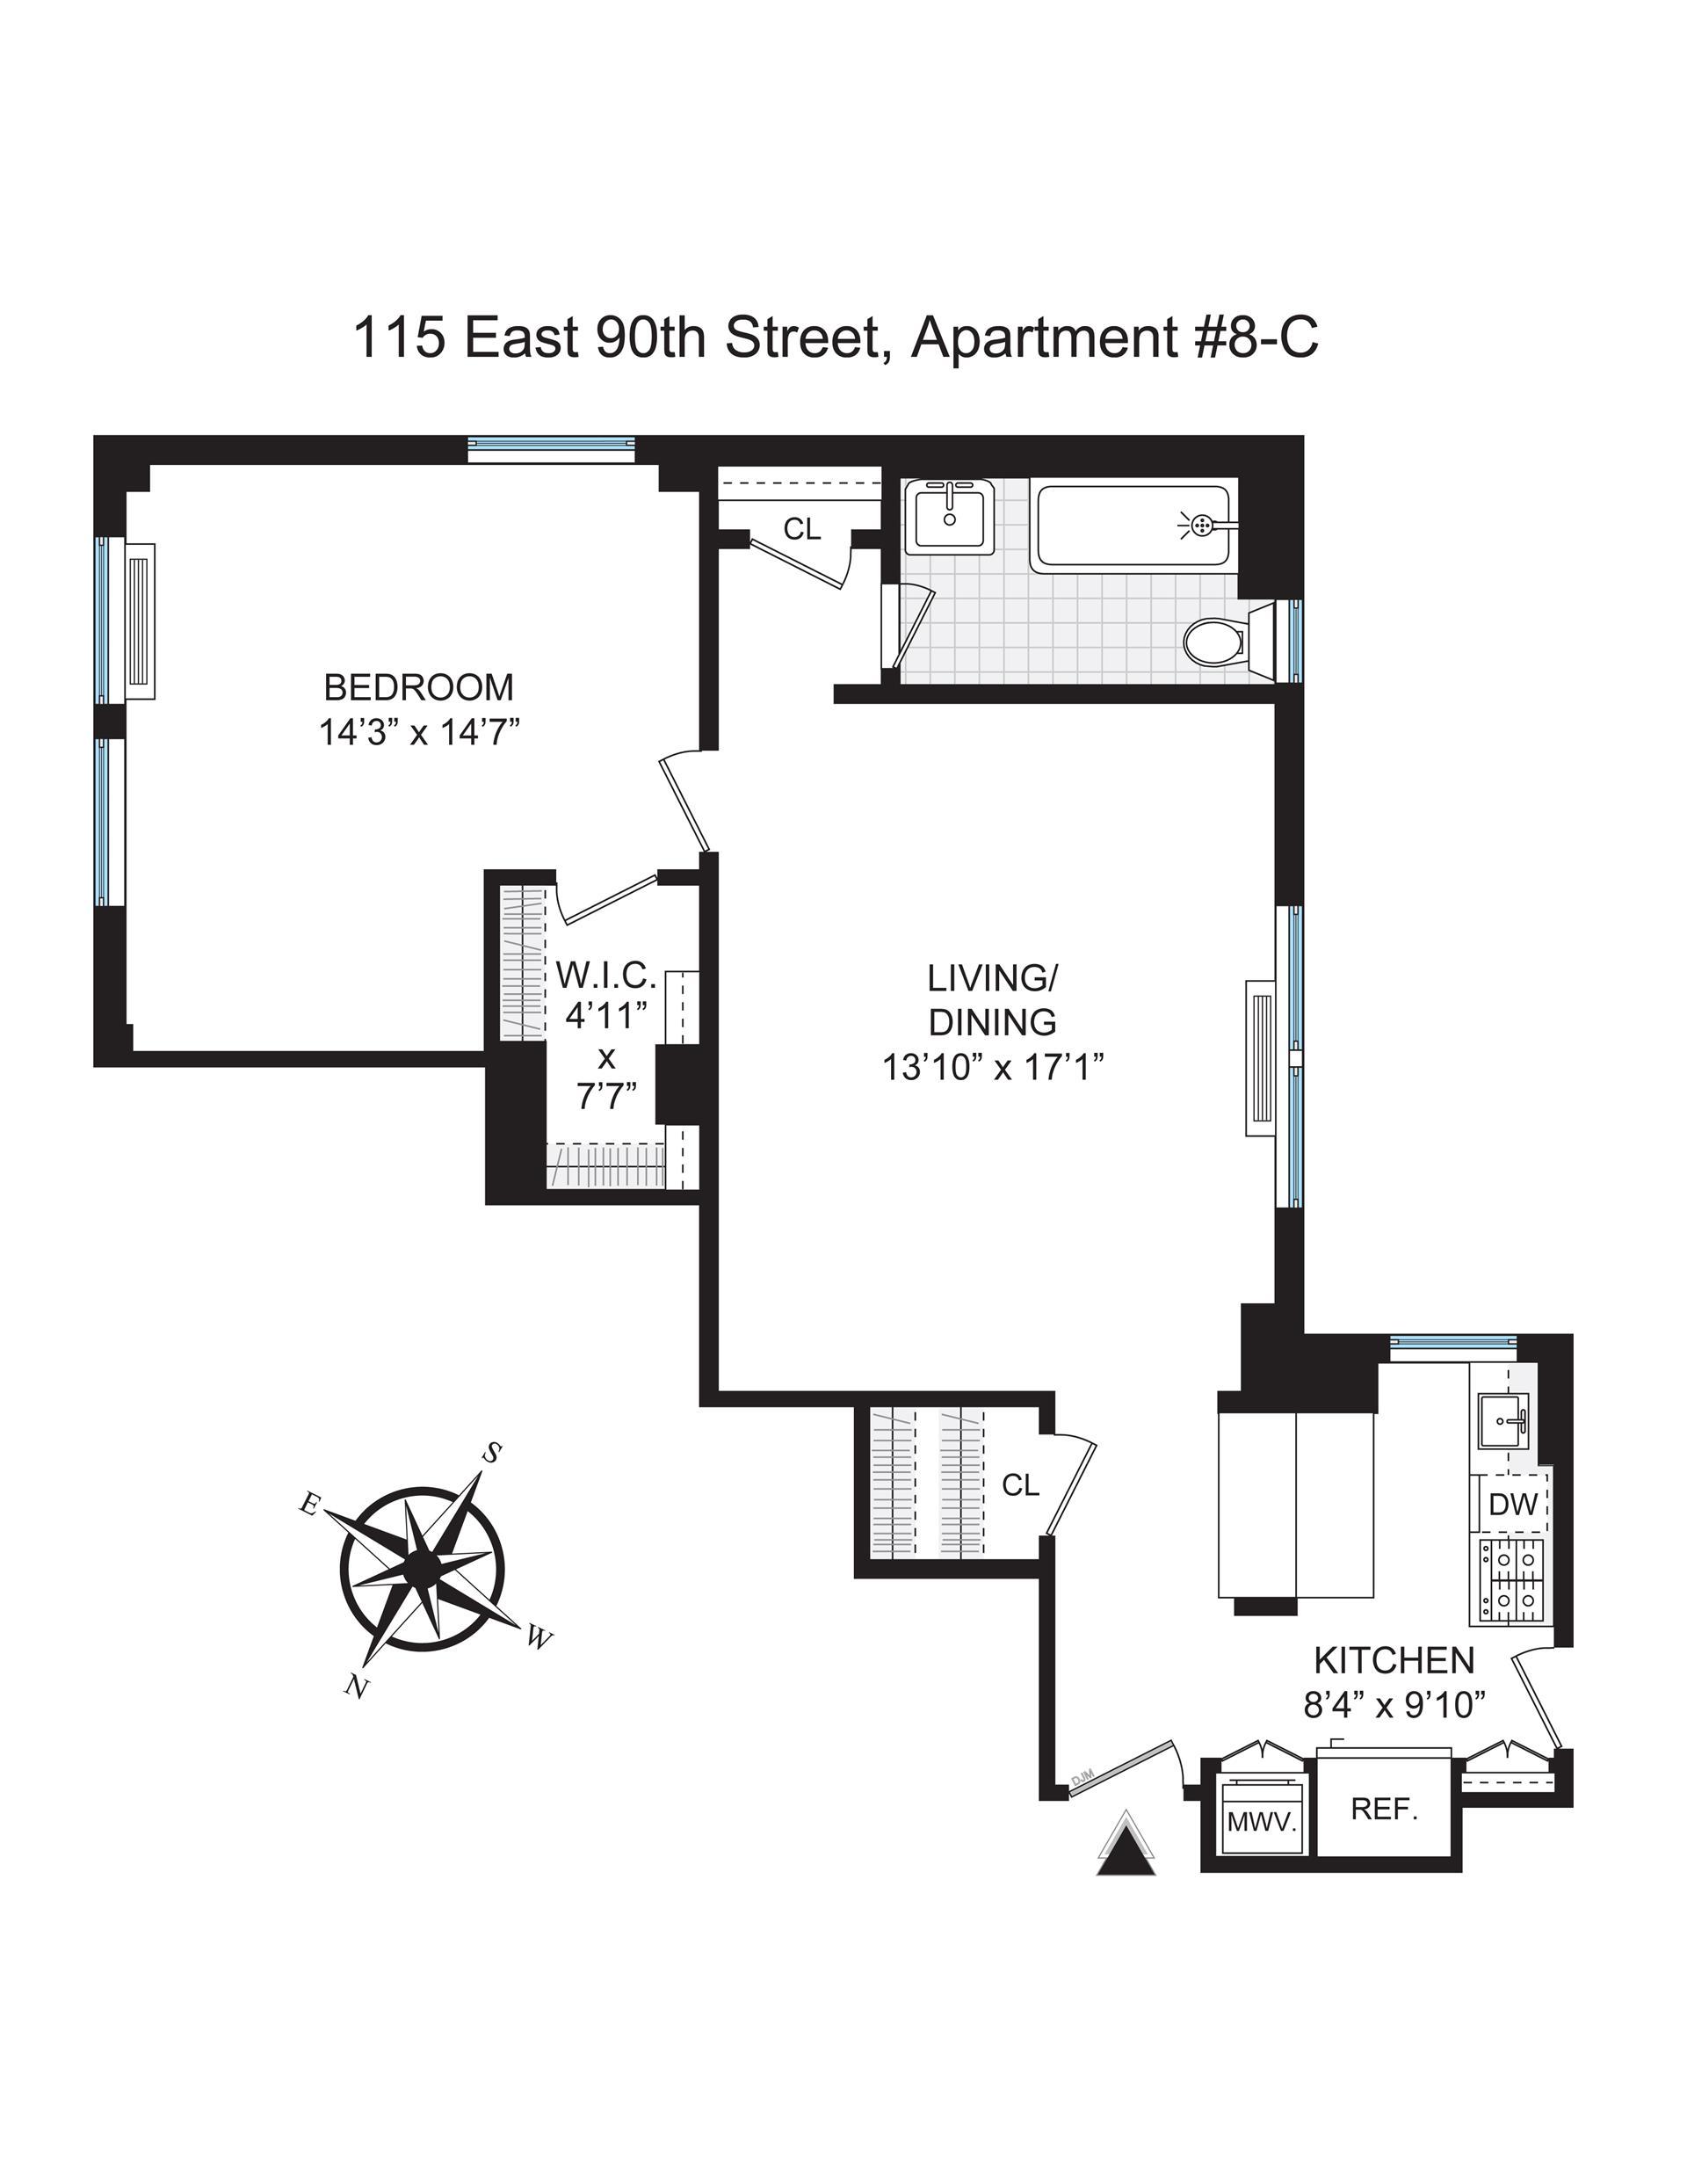 Floor plan of 115 TENANTS CORP., 115 East 90th Street, 8C - Upper East Side, New York